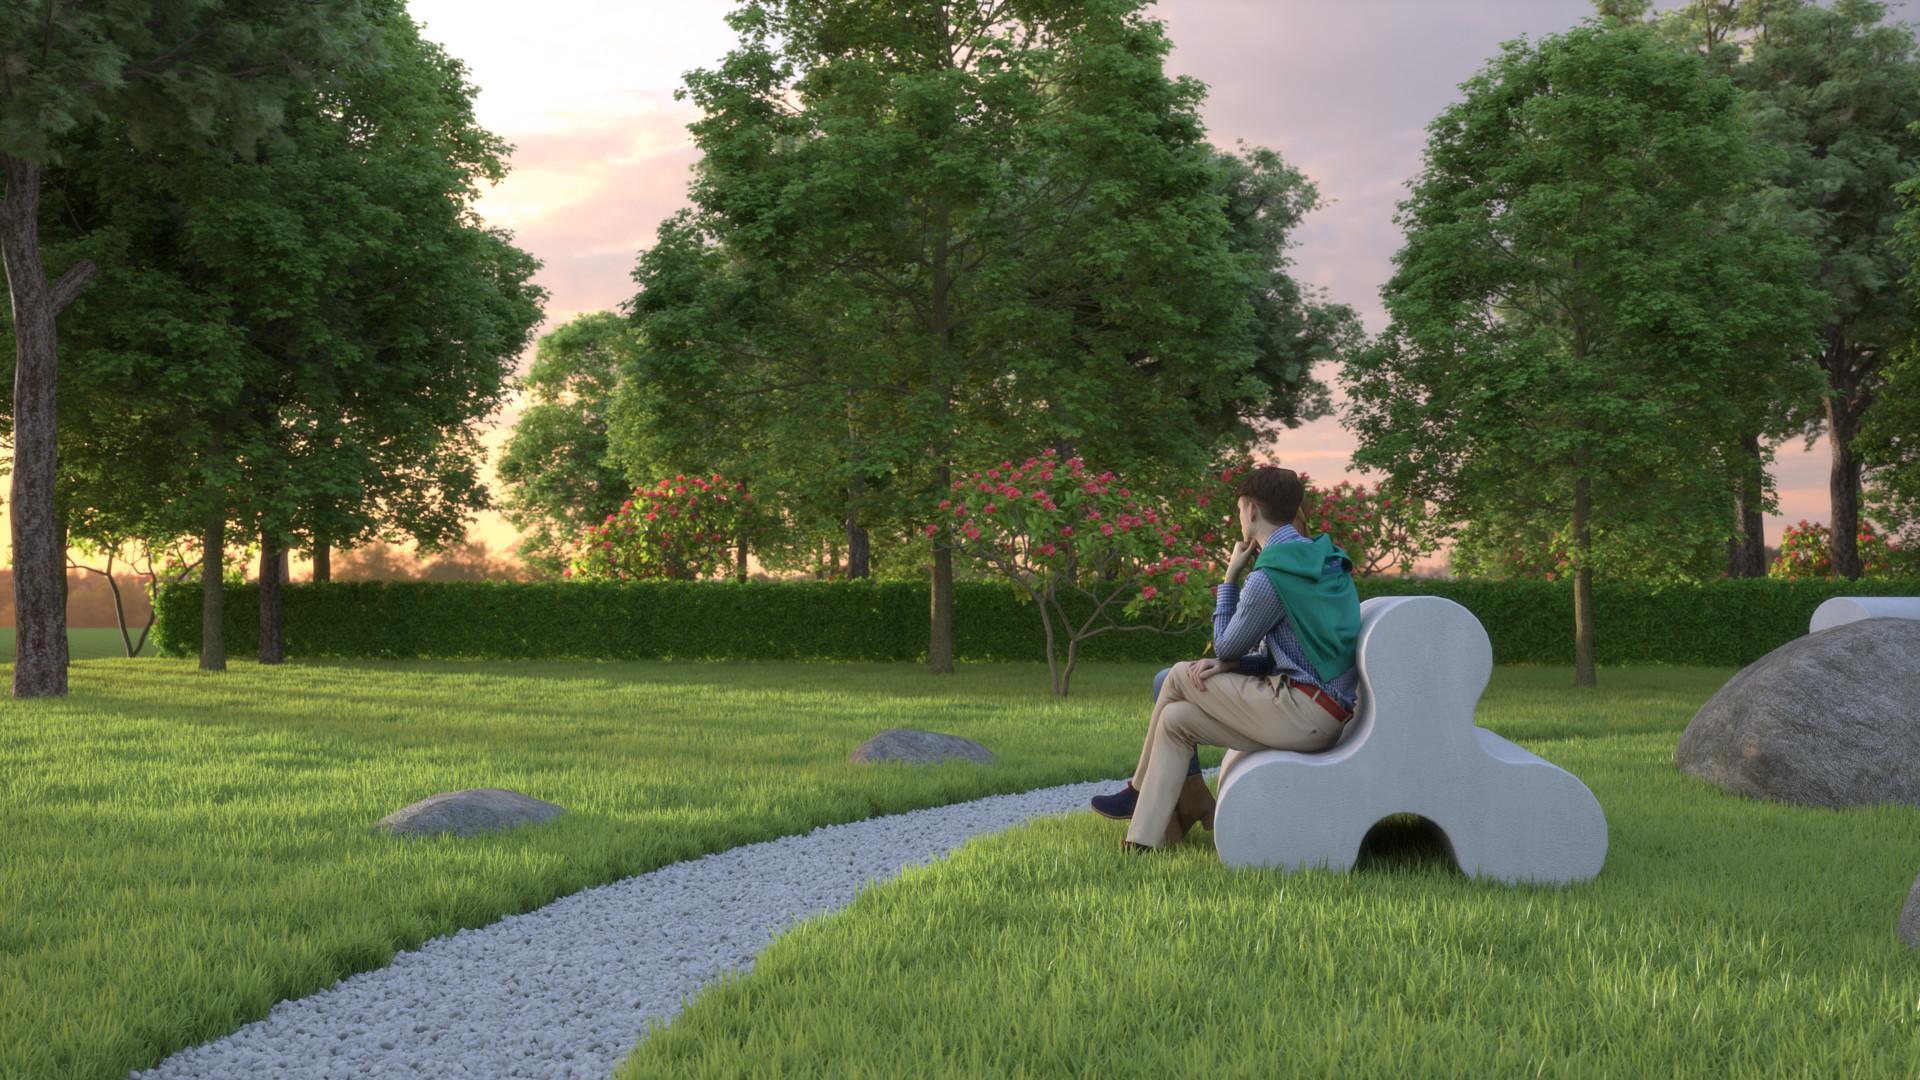 Duane kemp garden furniture for sofi dosa scene 6